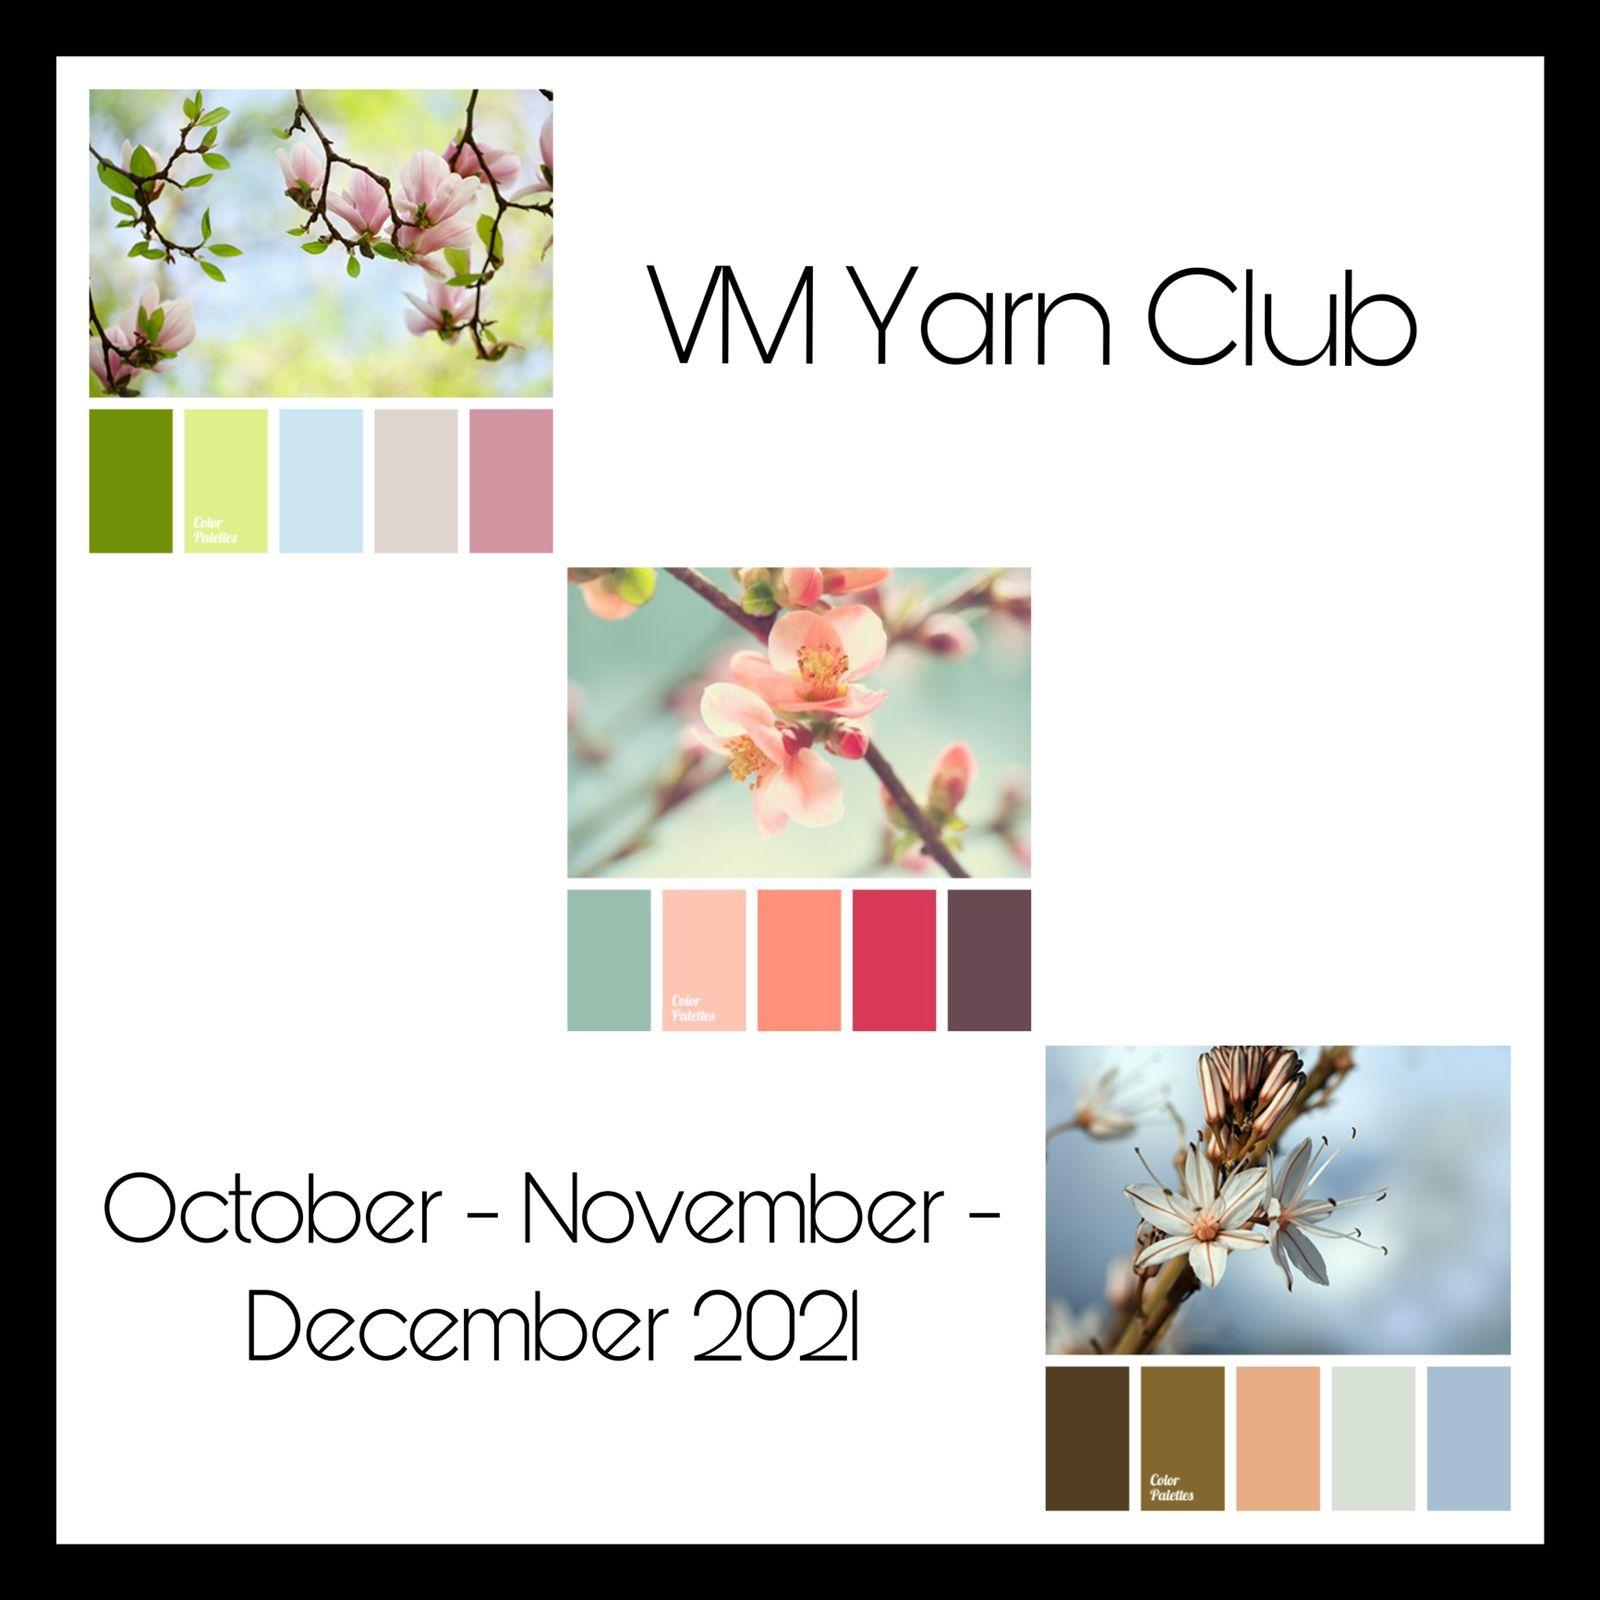 VM Yarn Club Trimestral (OCTUBRE - NOVIEMBRE -  DICIEMBRE)